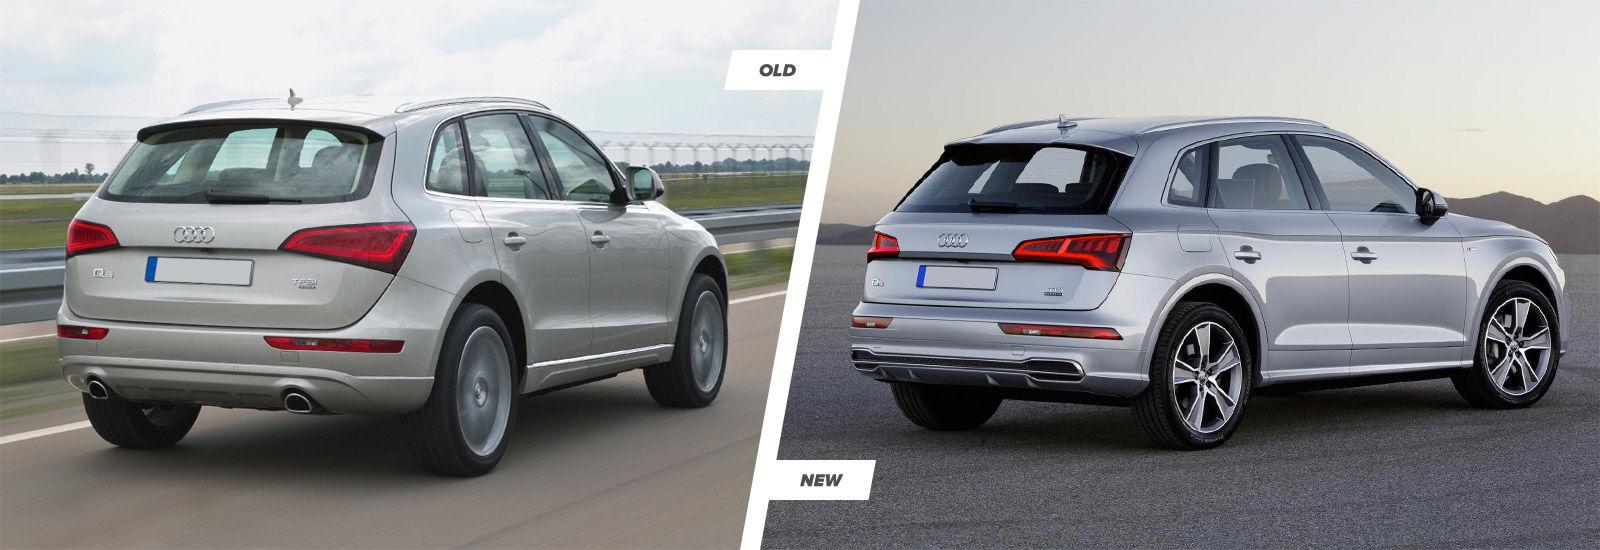 Audi Q5 Suv New Vs Old Compared Carwow